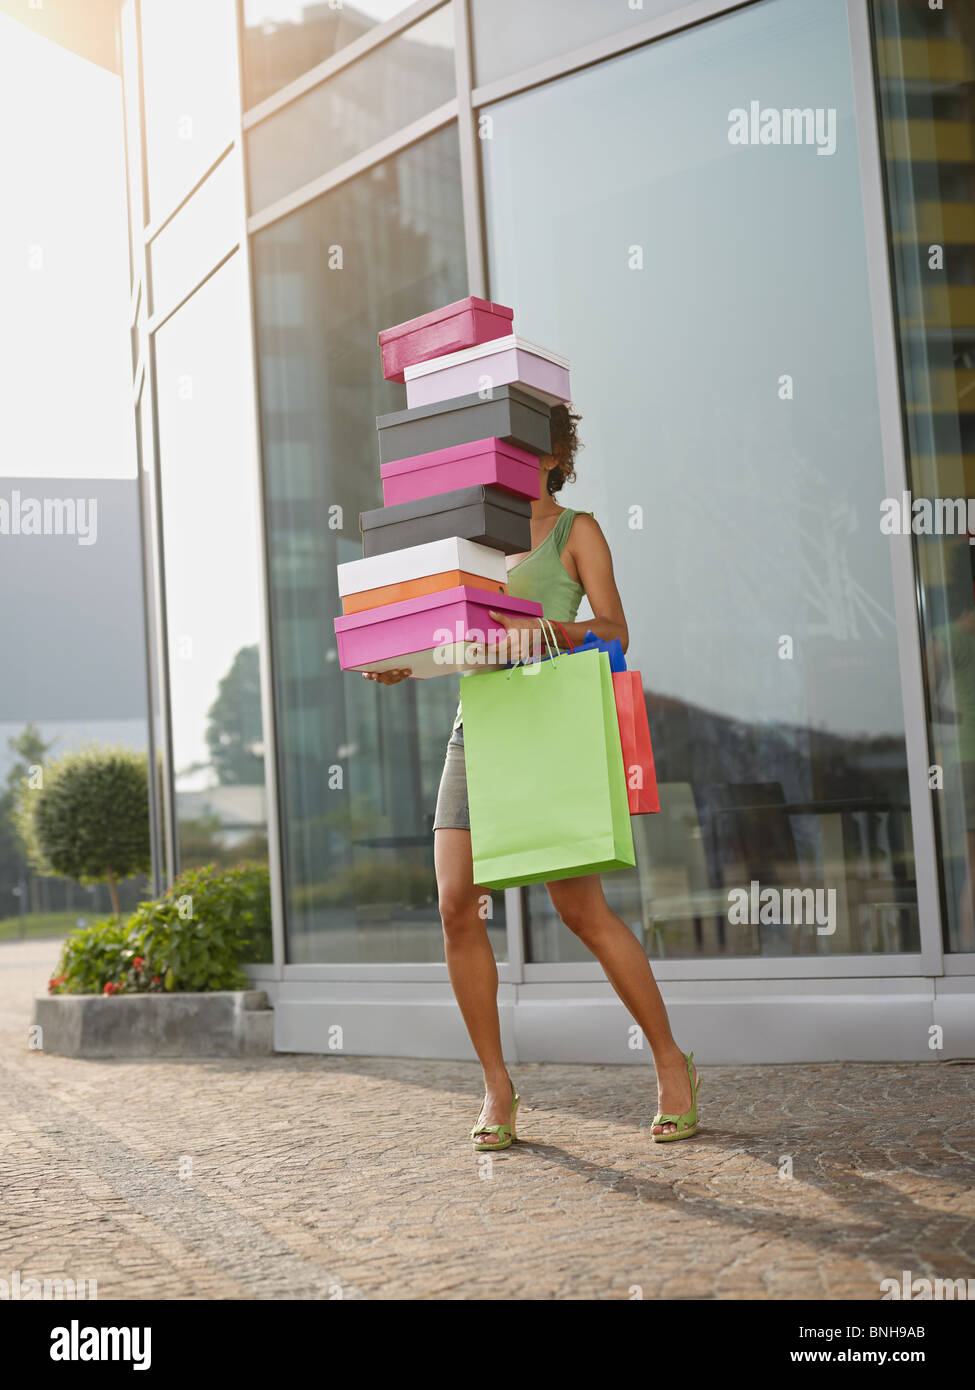 Hispanic Frau balancieren Stapel Schuhkartons aus Einkaufszentrum. Vertikale Form, Ganzkörperansicht, Textfreiraum Stockbild